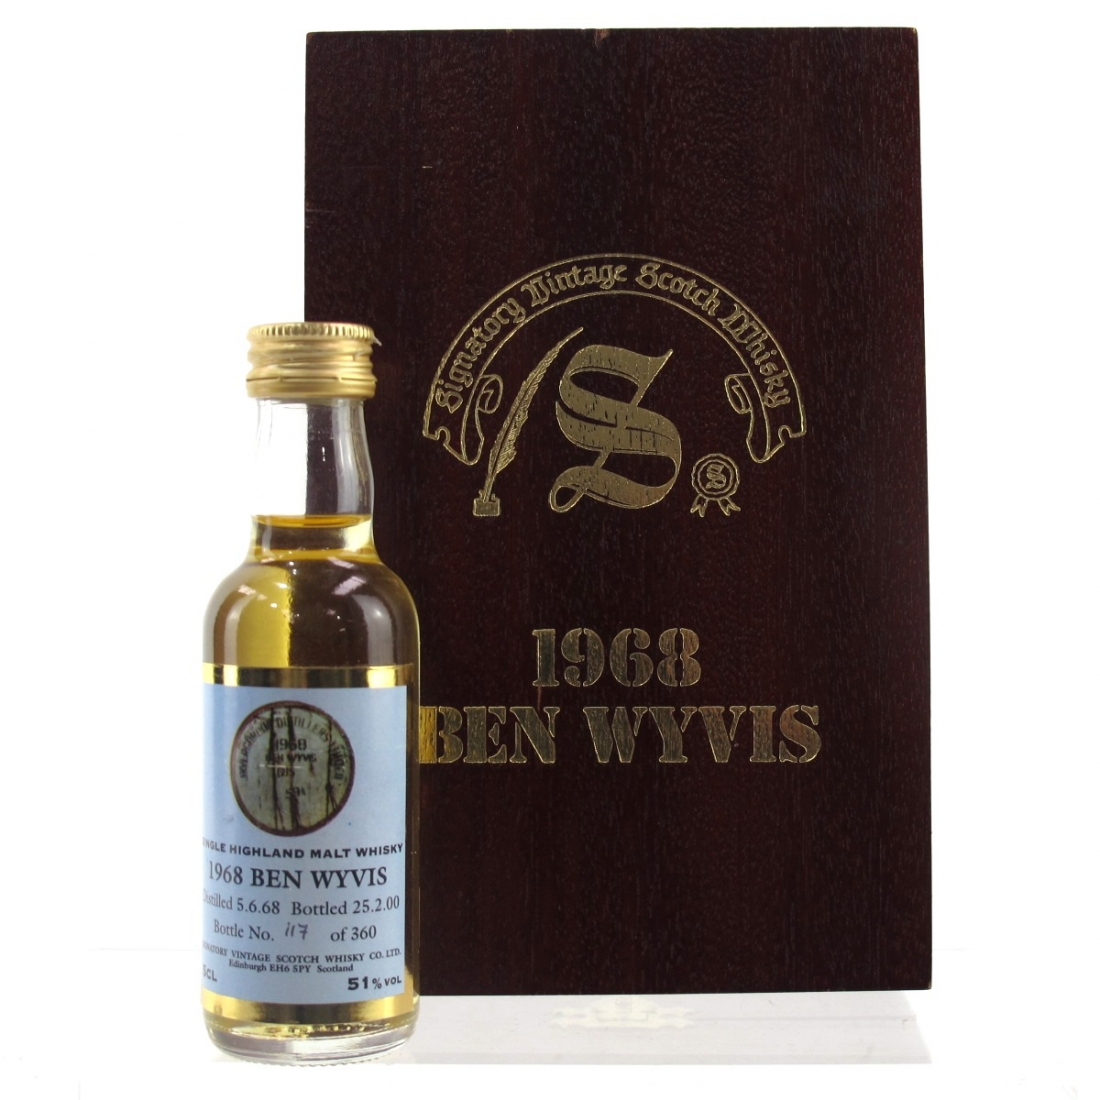 Ben Wyvis 1968 Signatory Vintage Miniature 5cl